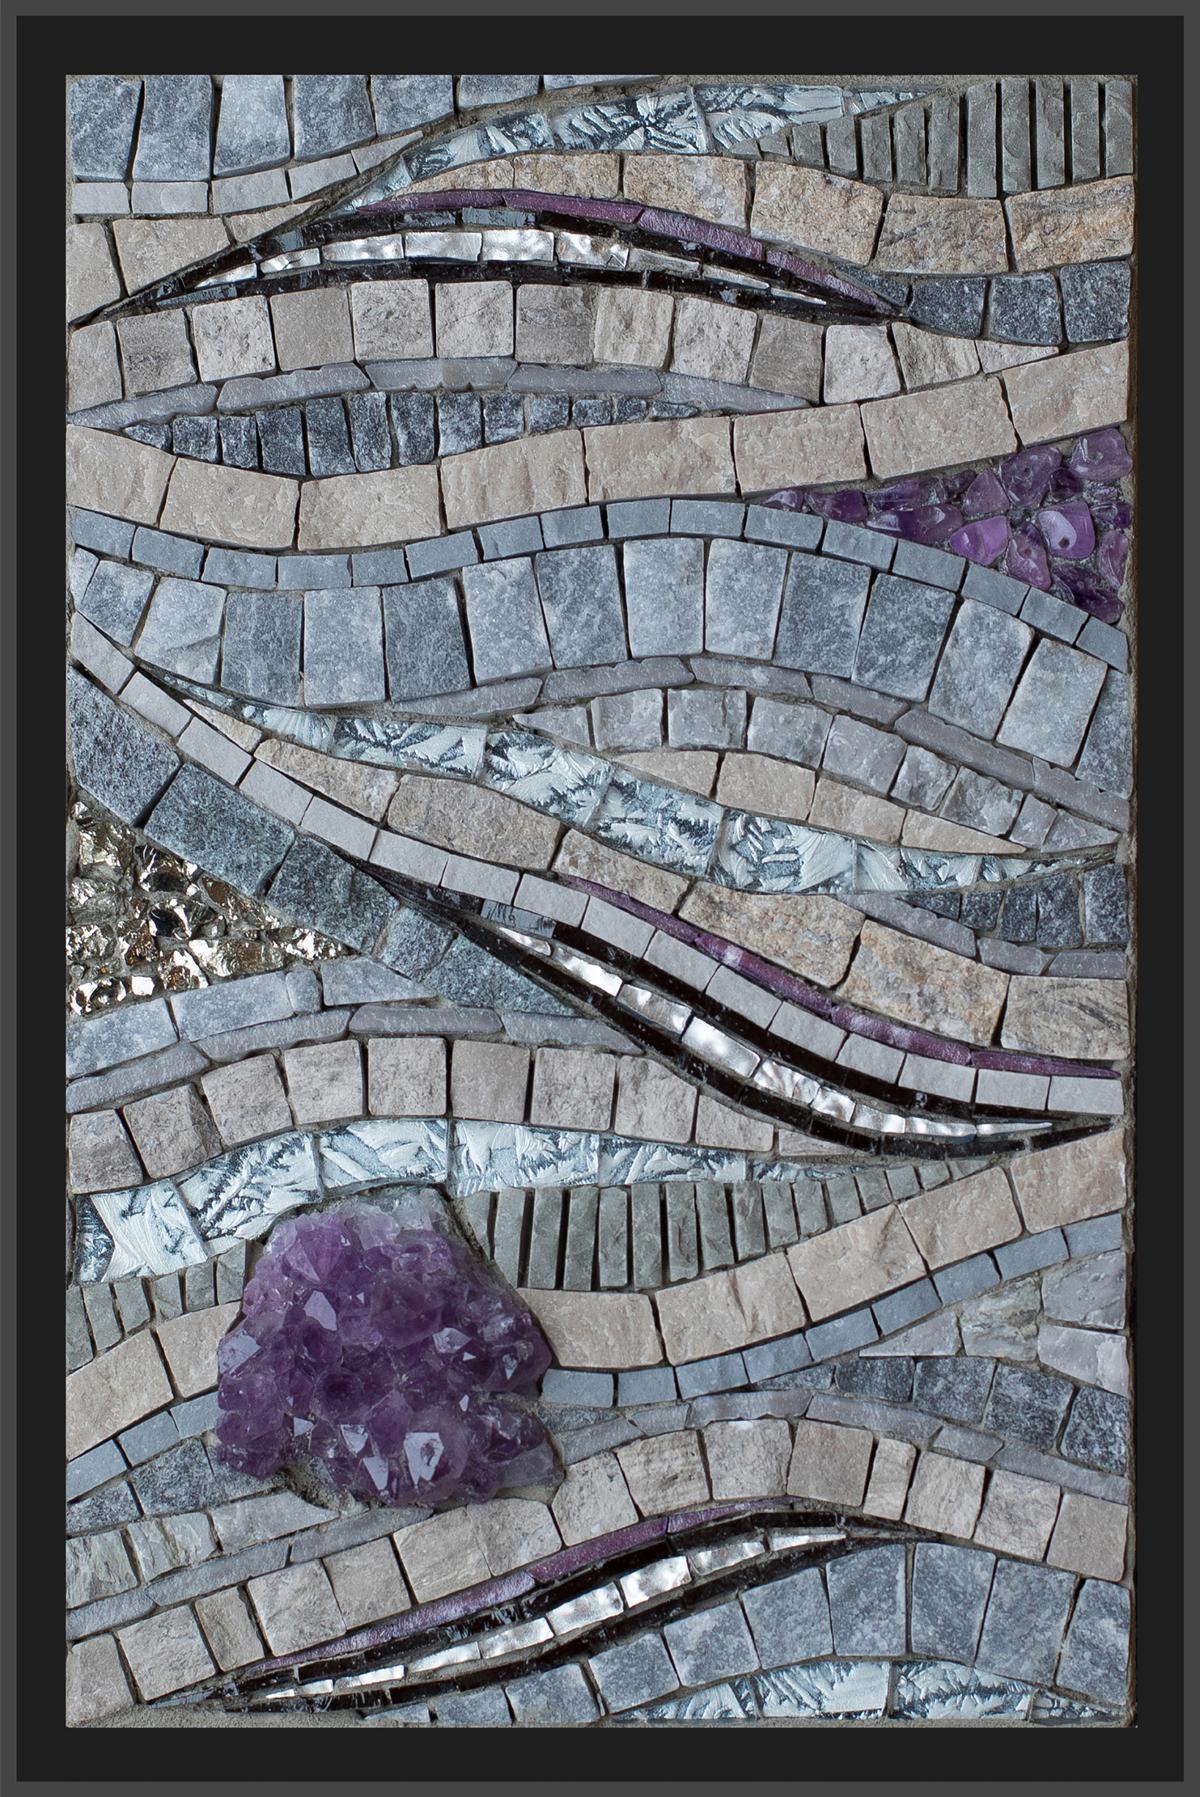 "On the Horizon  (2017) 8.5"" x 5.5""| 22cm x 14cm.Marble, porcelain, vitreous, Van Gogh glass, mosaic gold, contorno, amethyst. pyrite"